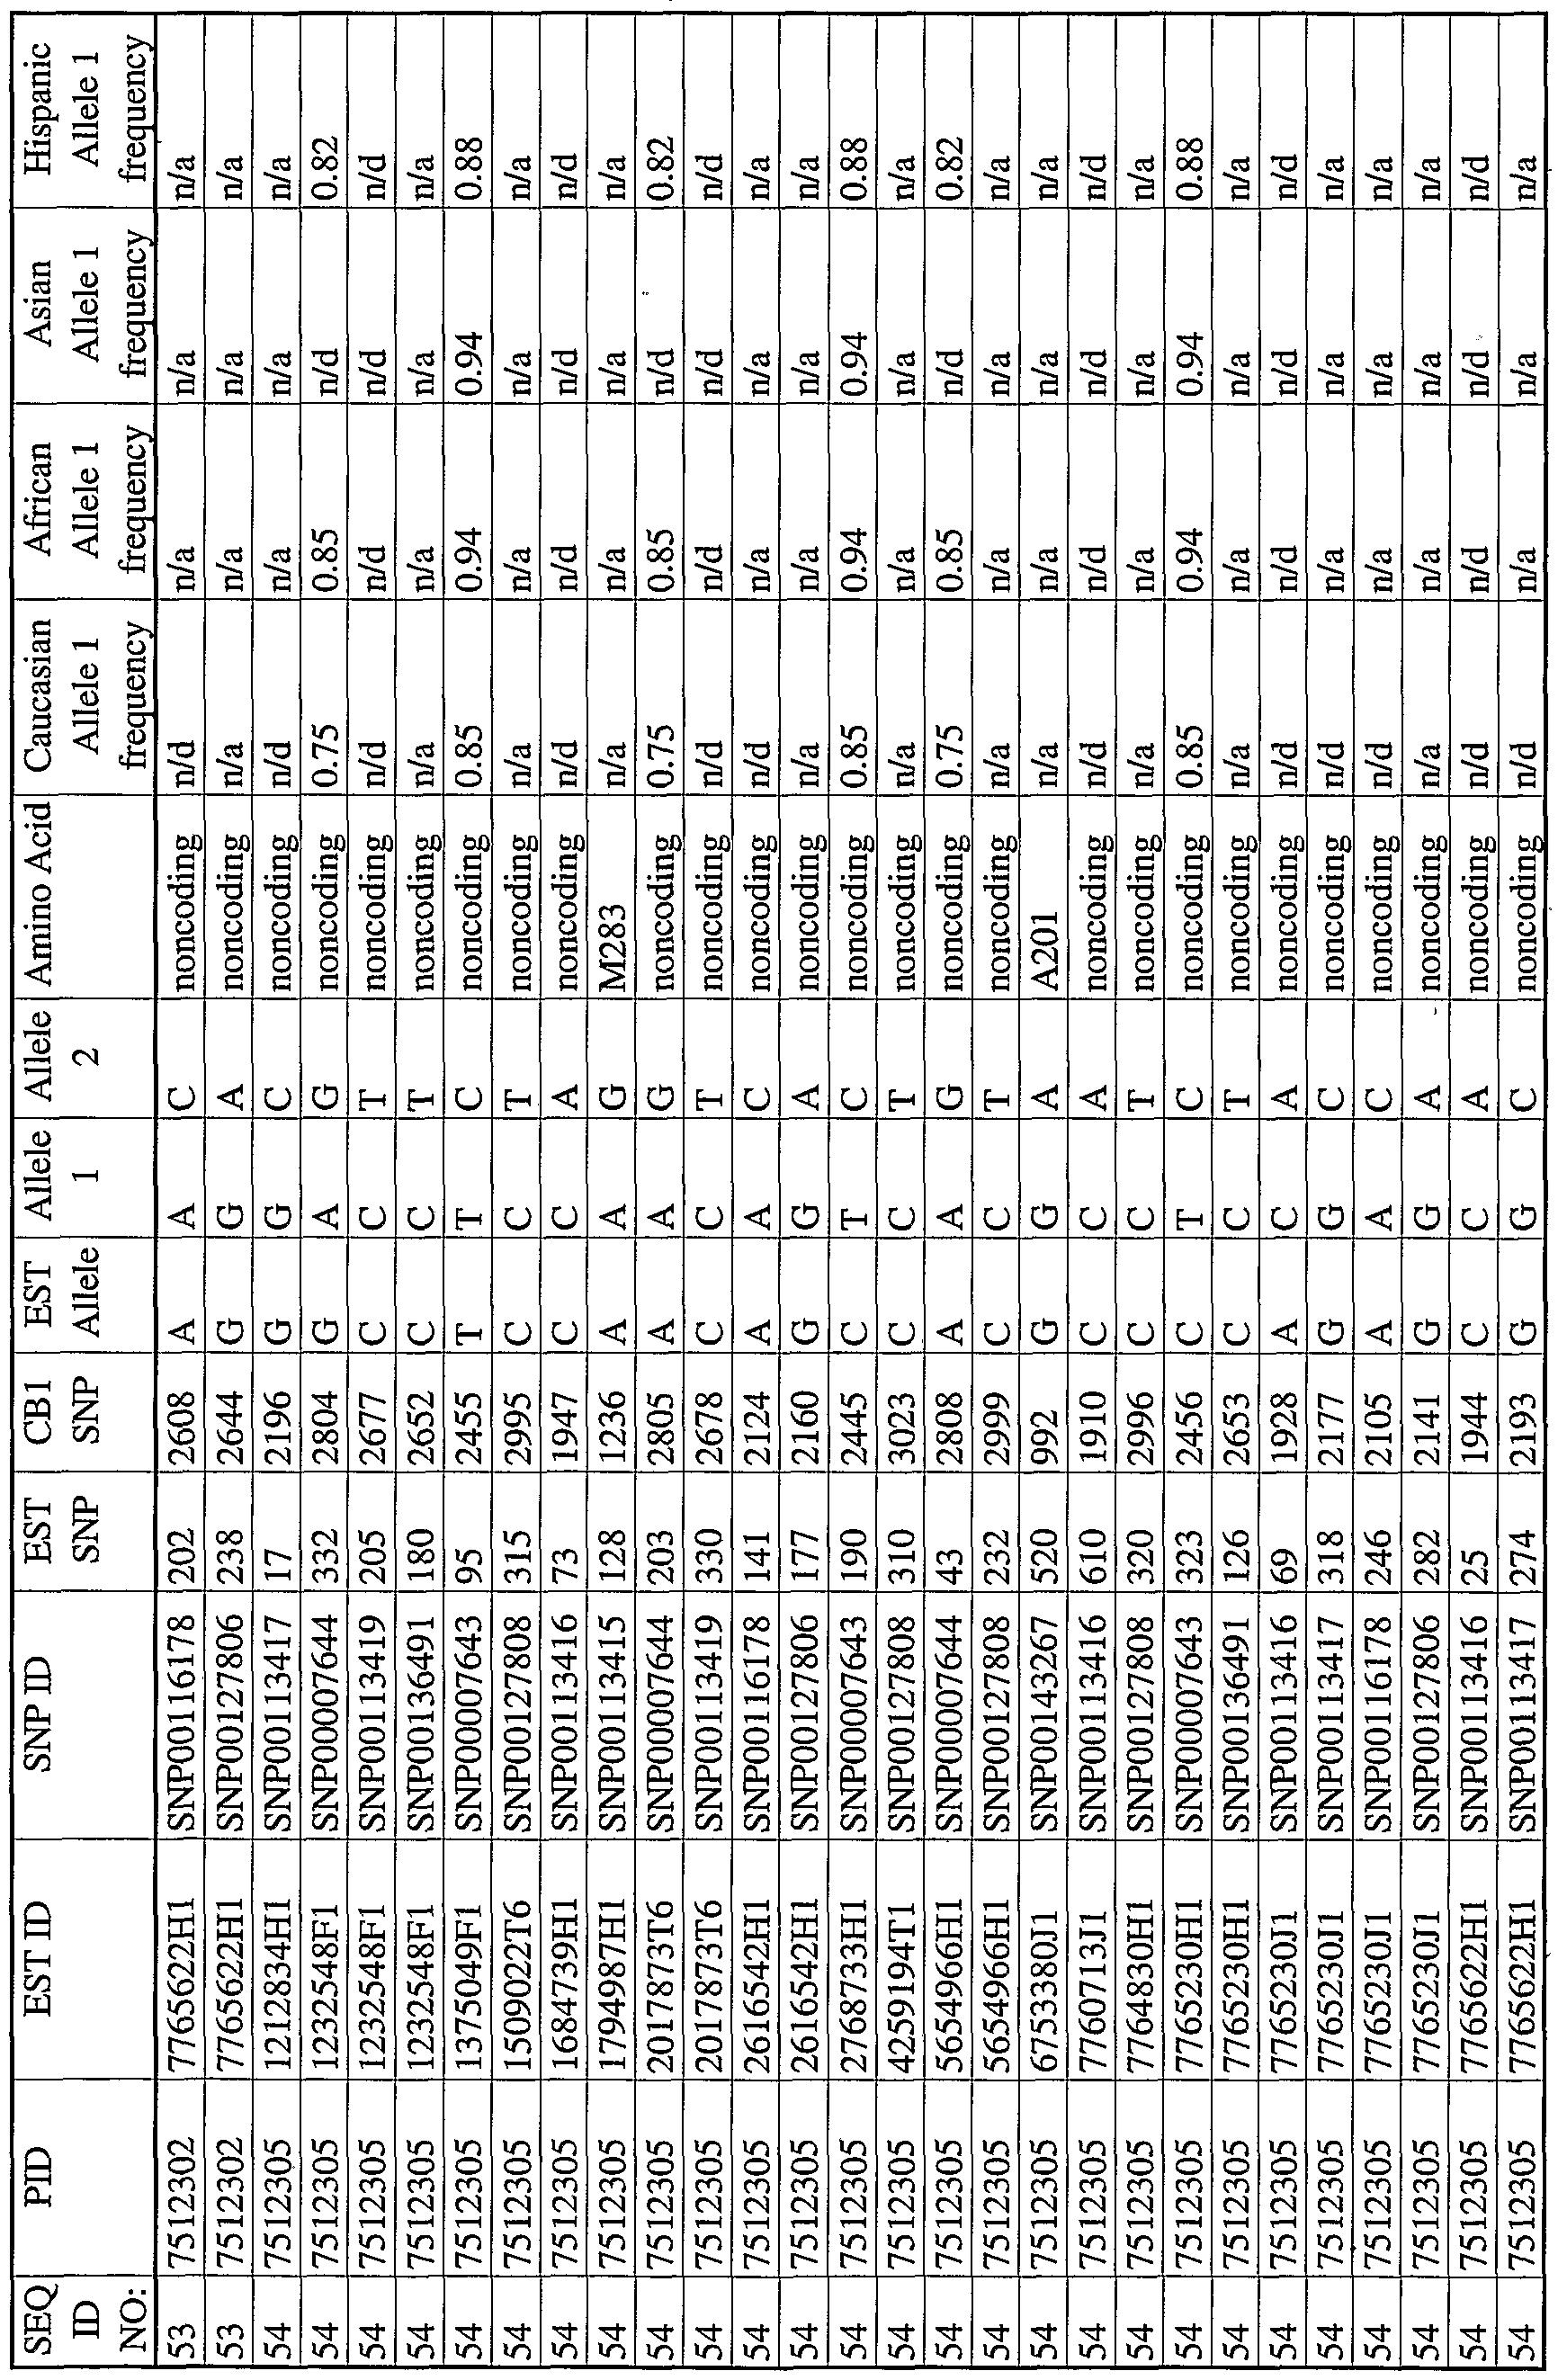 WO2004003162A2 - Enzymes - Google Patents